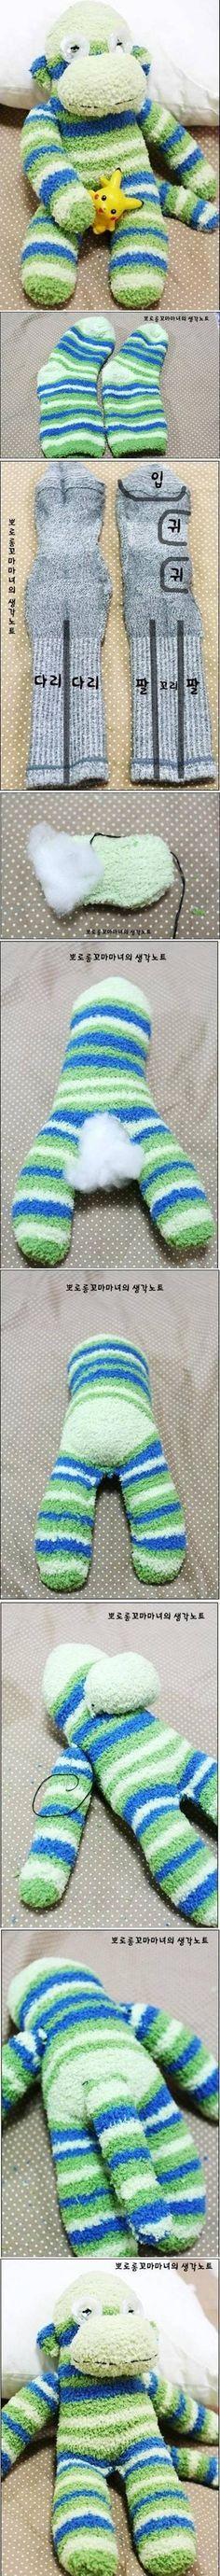 DIY Sock Monkey Terry DIY Projects | UsefulDIY.com